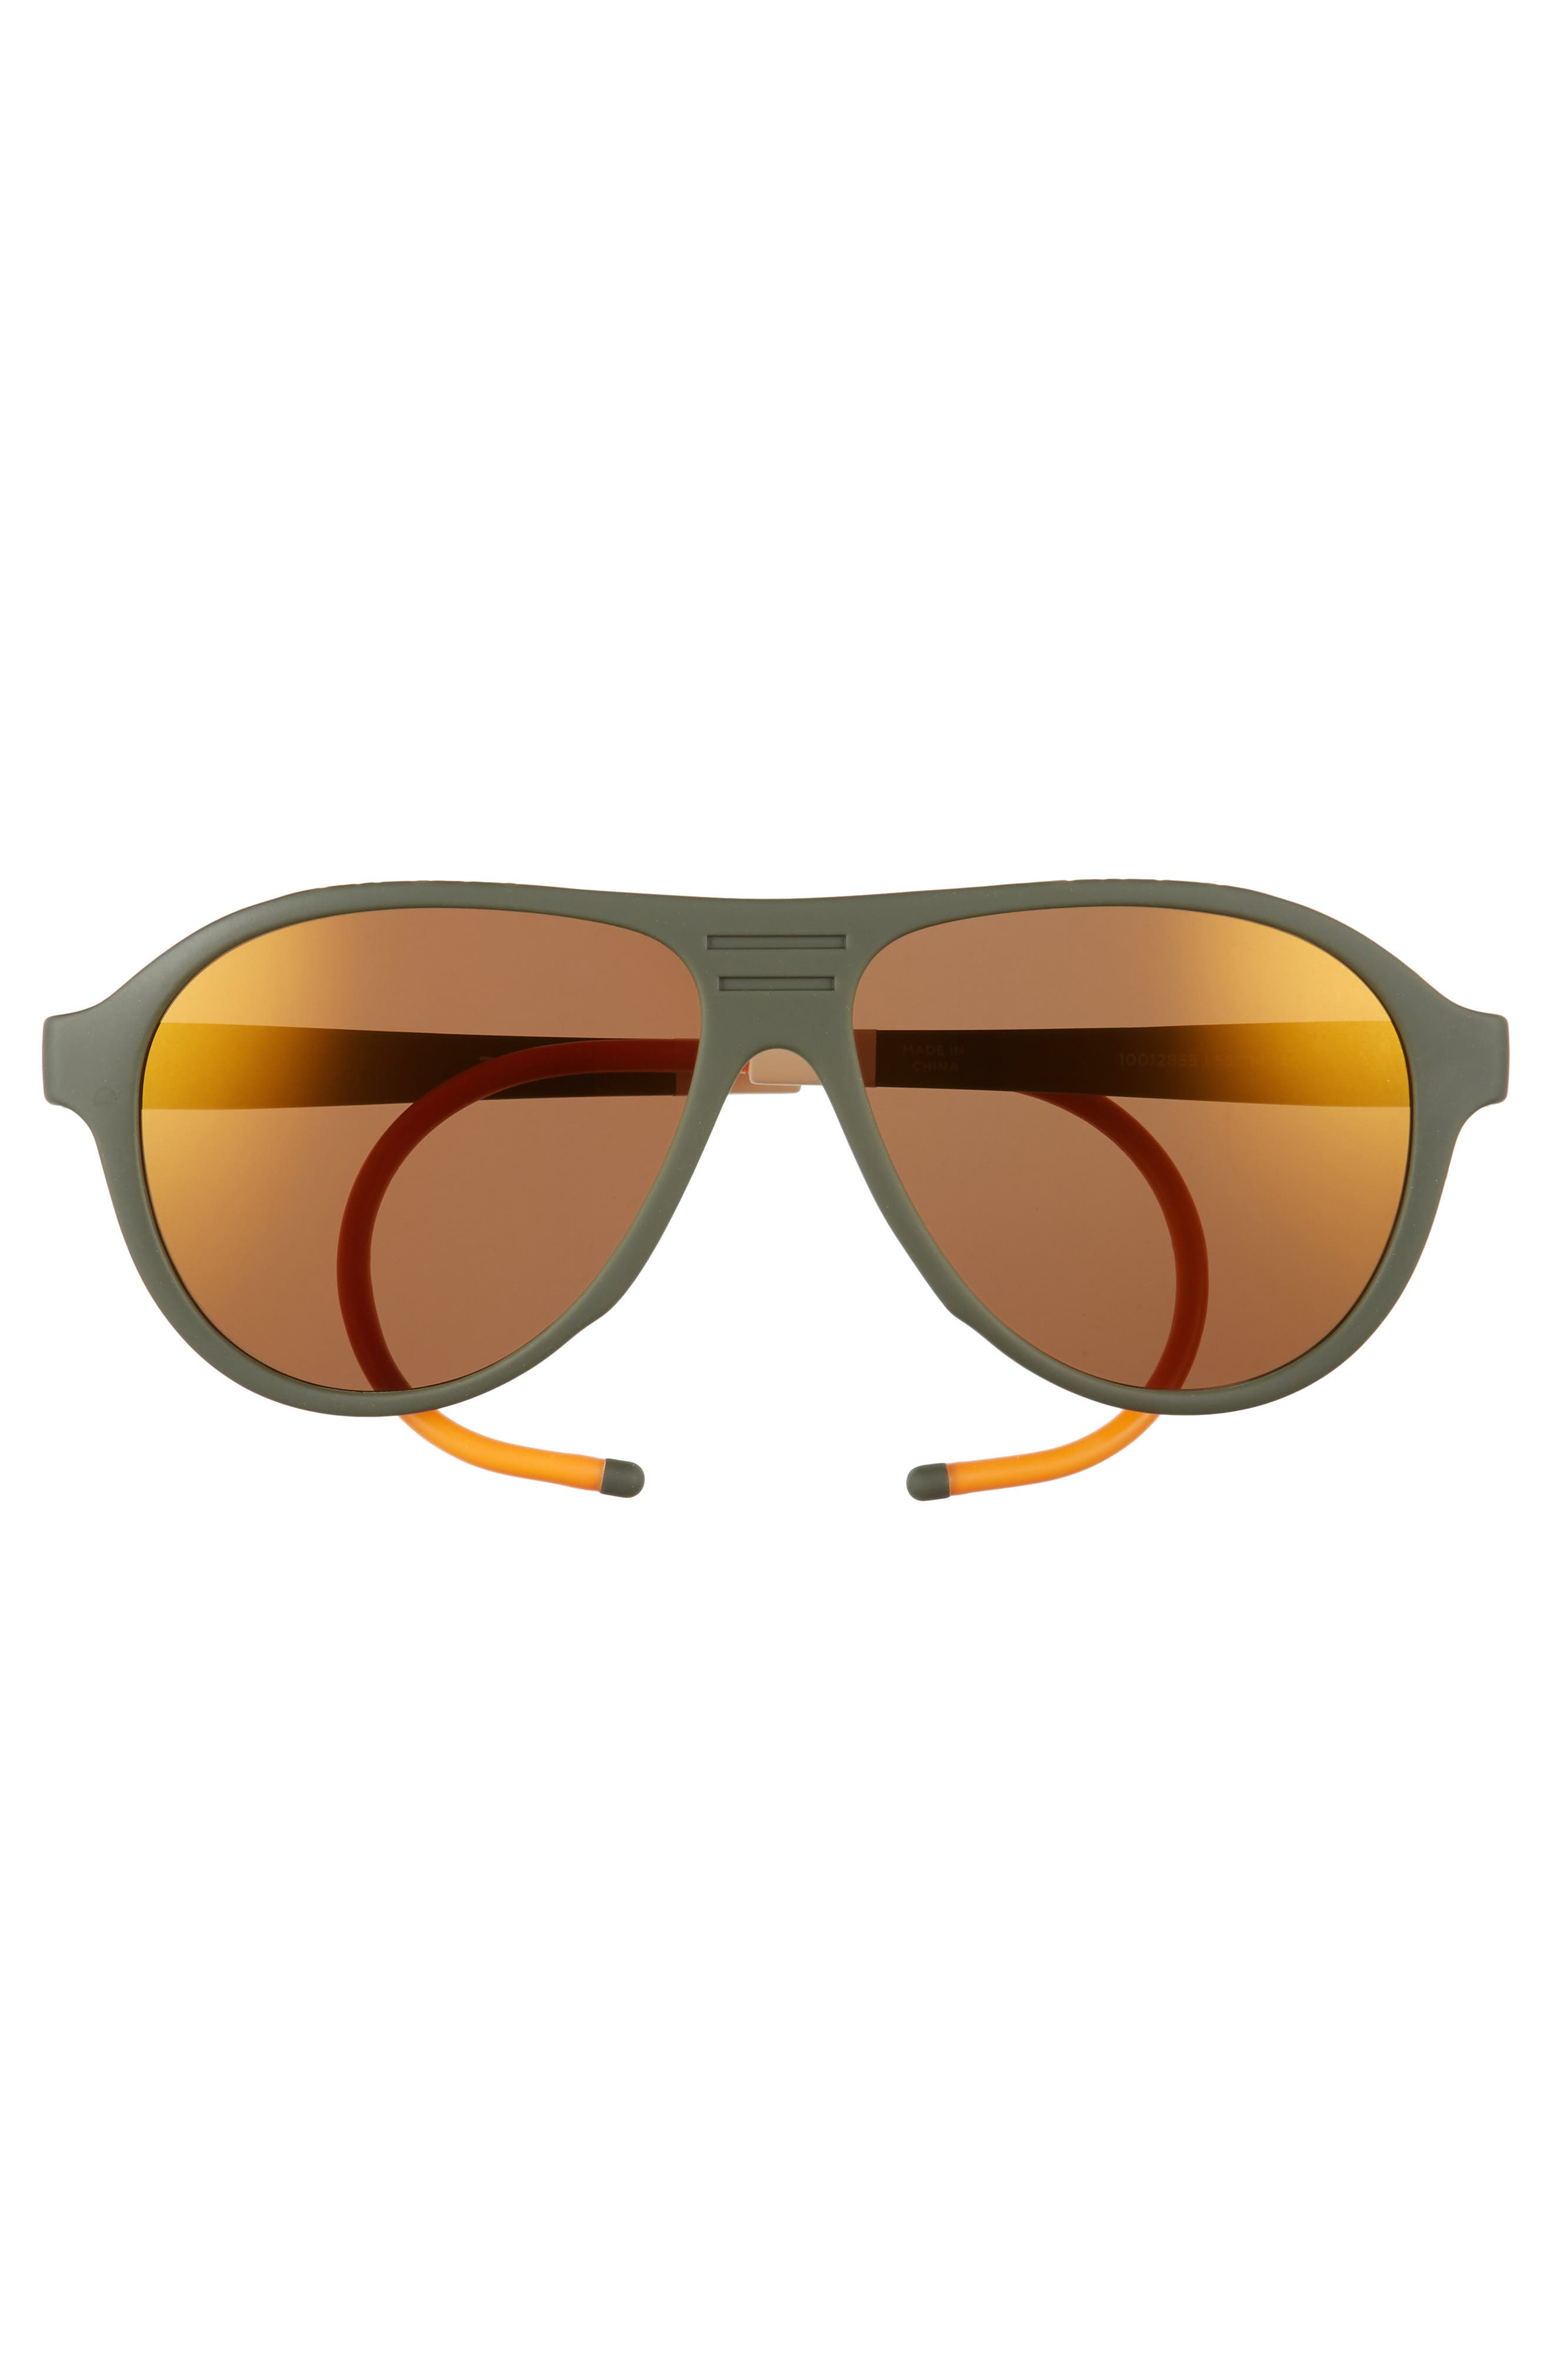 Traveler Zion 57mm Aviator Sunglasses,                             Alternate thumbnail 2, color,                             Matte Rifle Green/ Gold Mirror